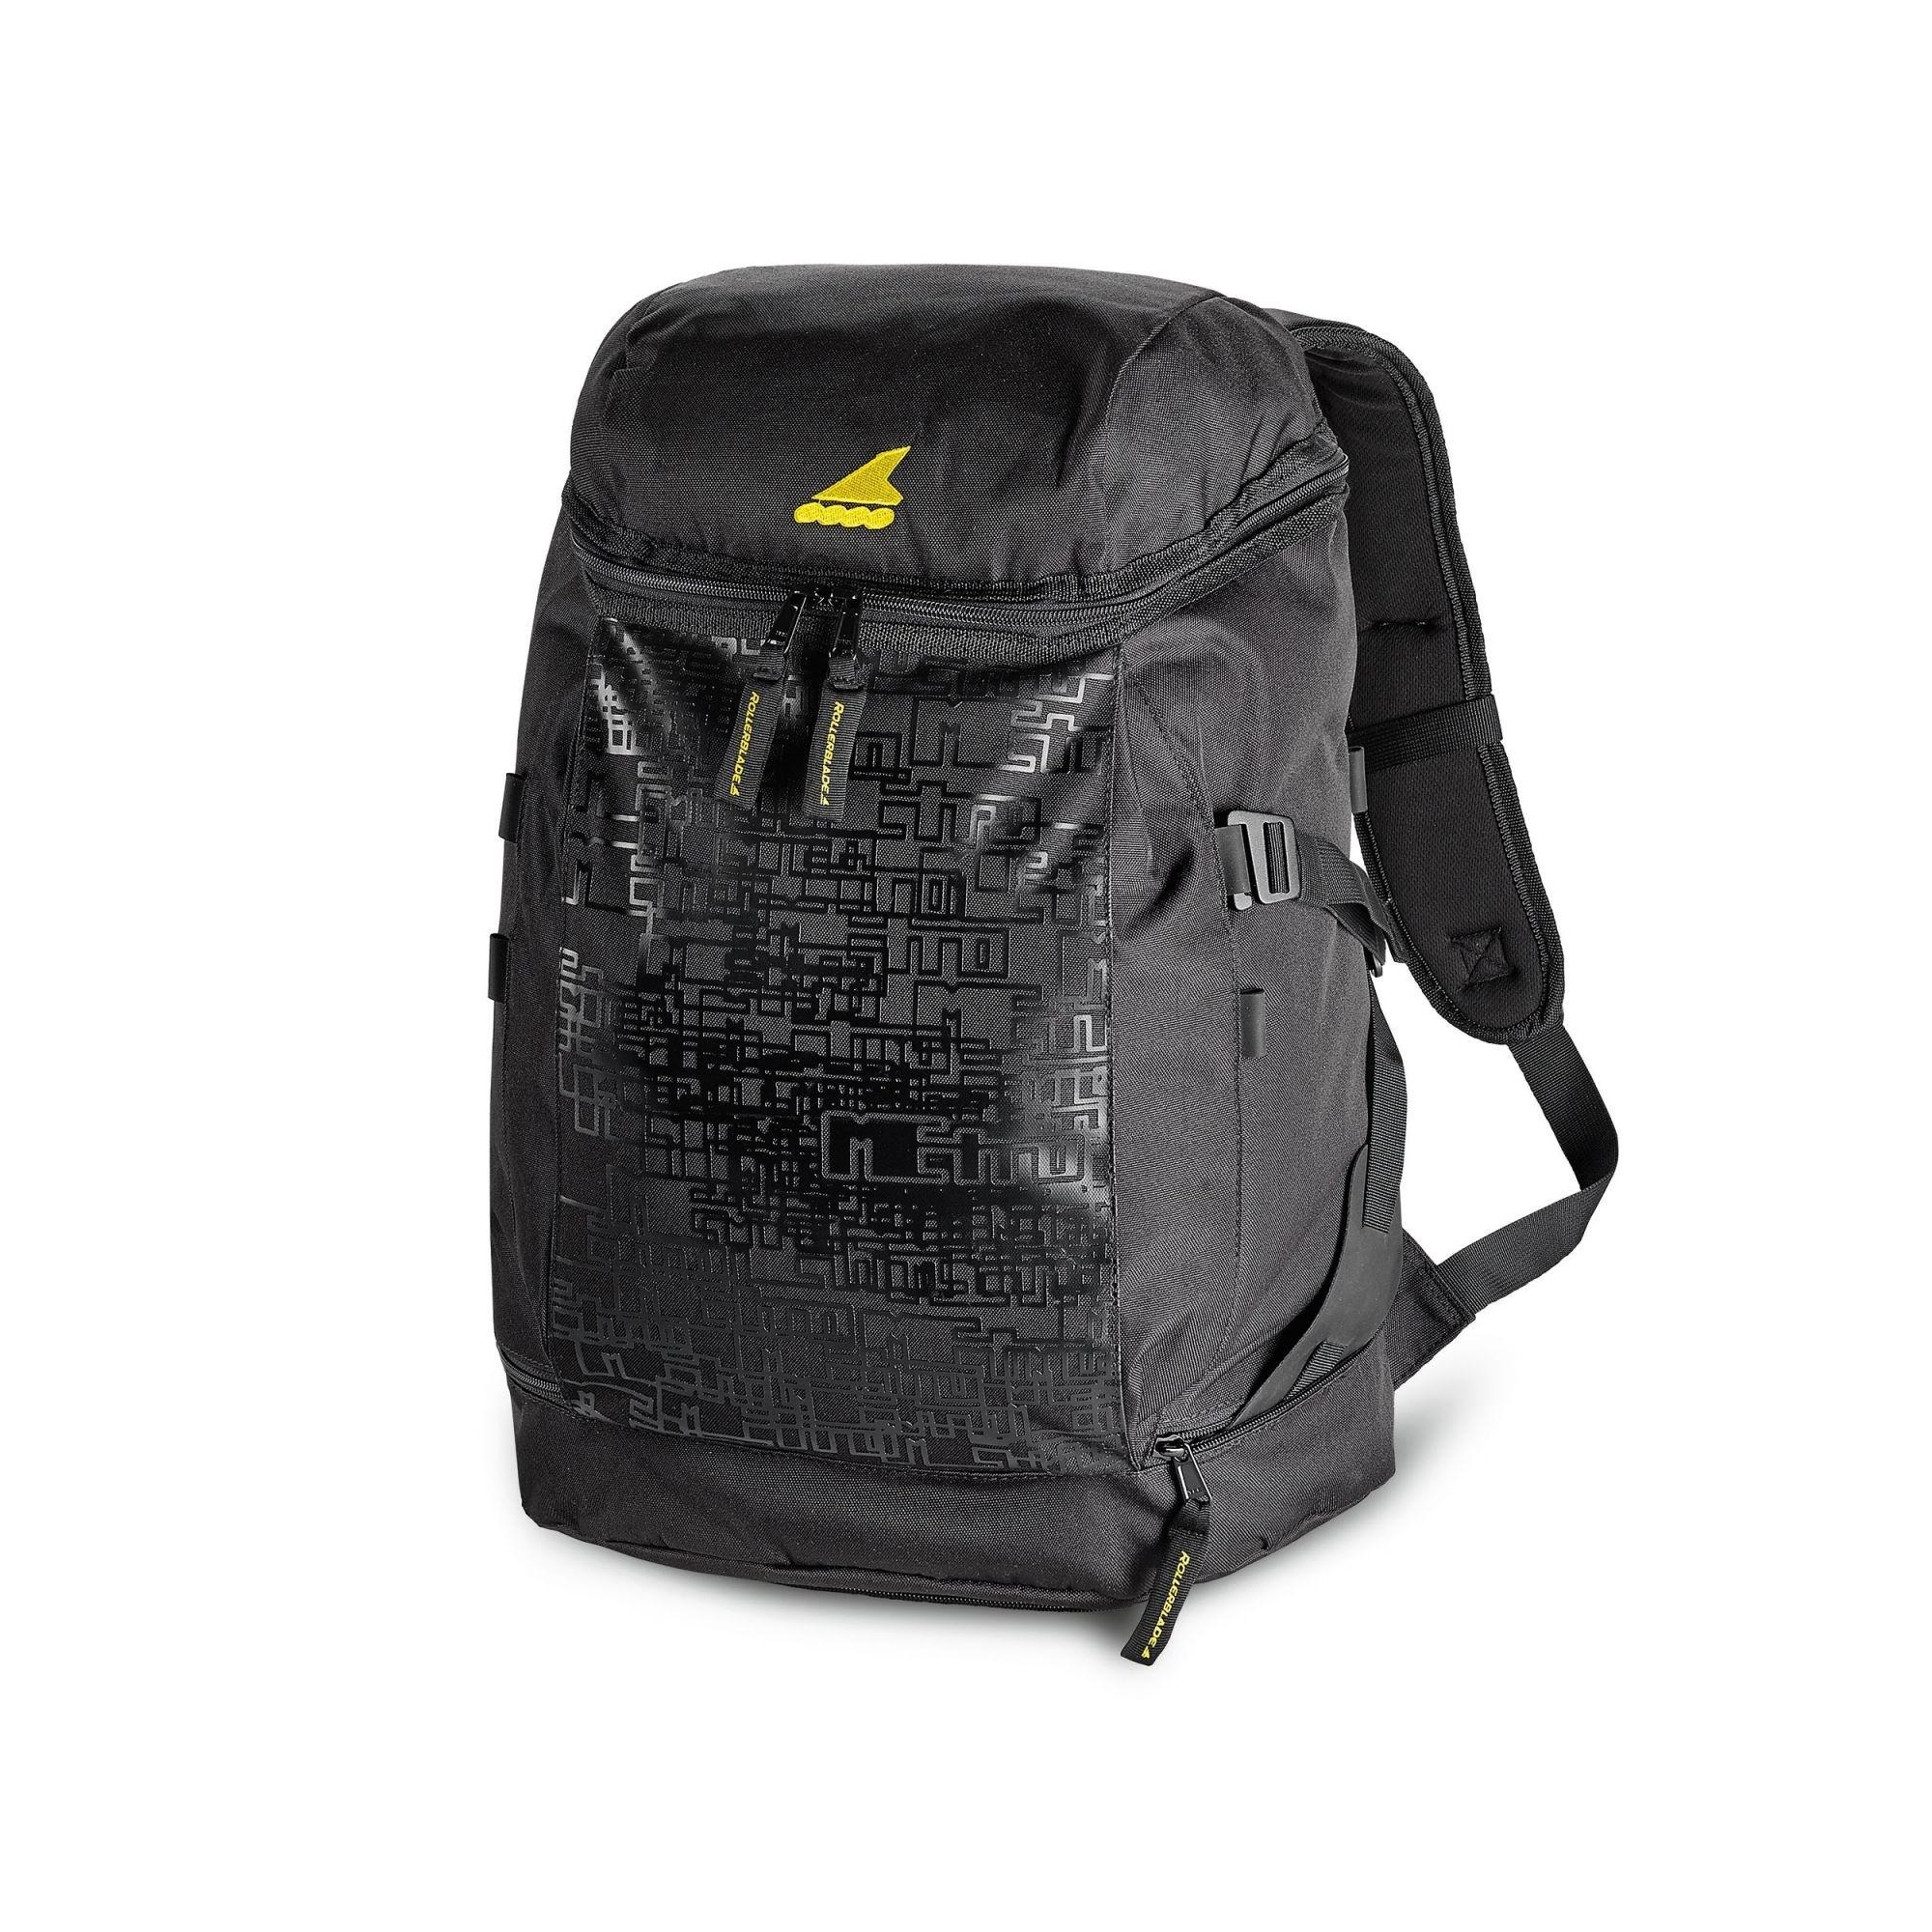 ca8f78589ec Rollerblade urban backpack lt 20 rugtas rollerblade urban backpack in de  kleur zwart met grijs de